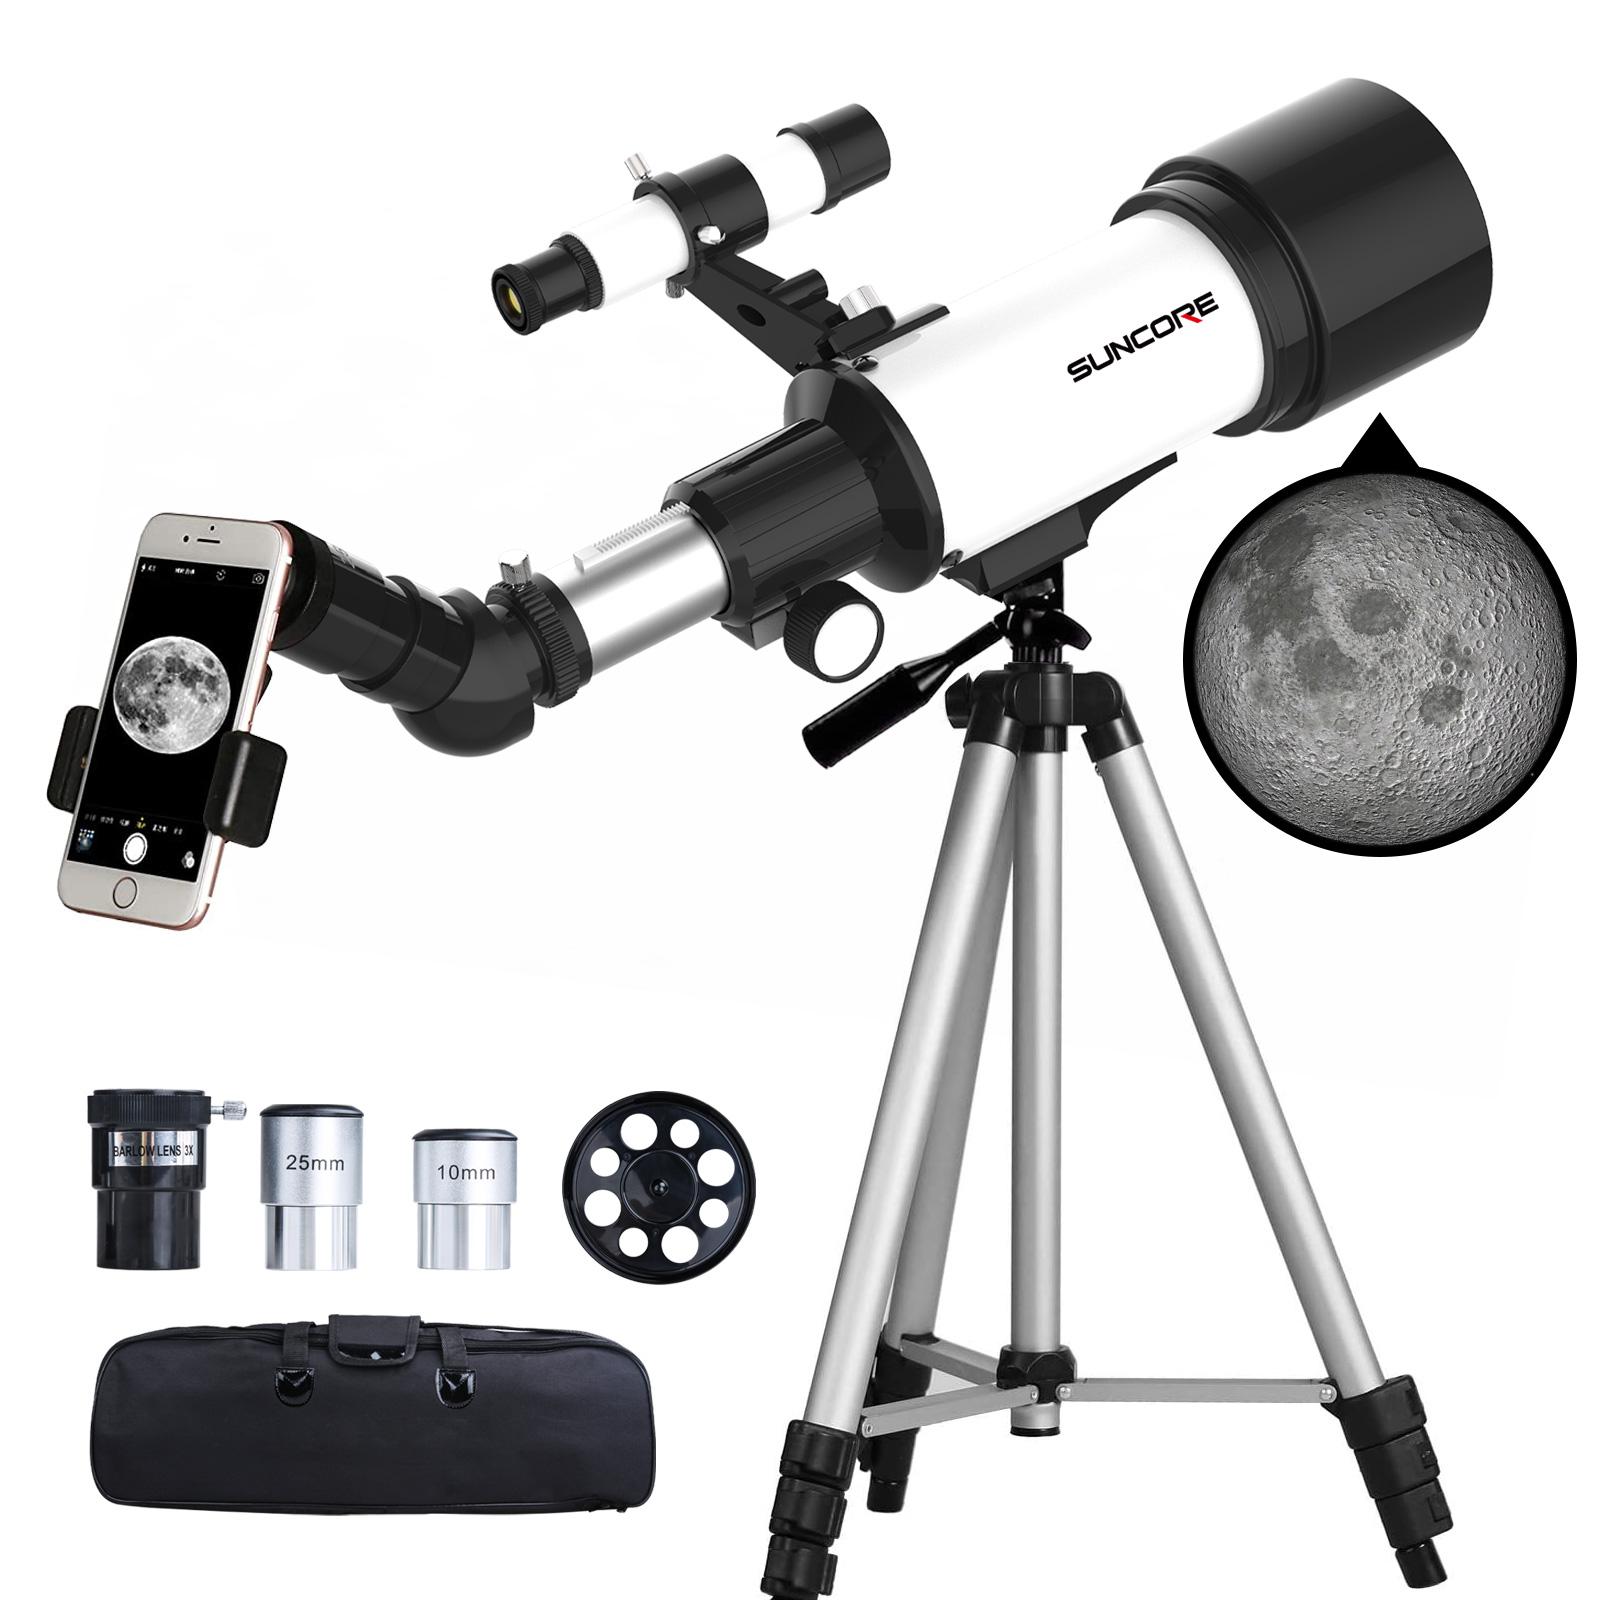 SUNCORE舜光 天文望远镜70400 高清大倍率 可替换镜头切换倍率